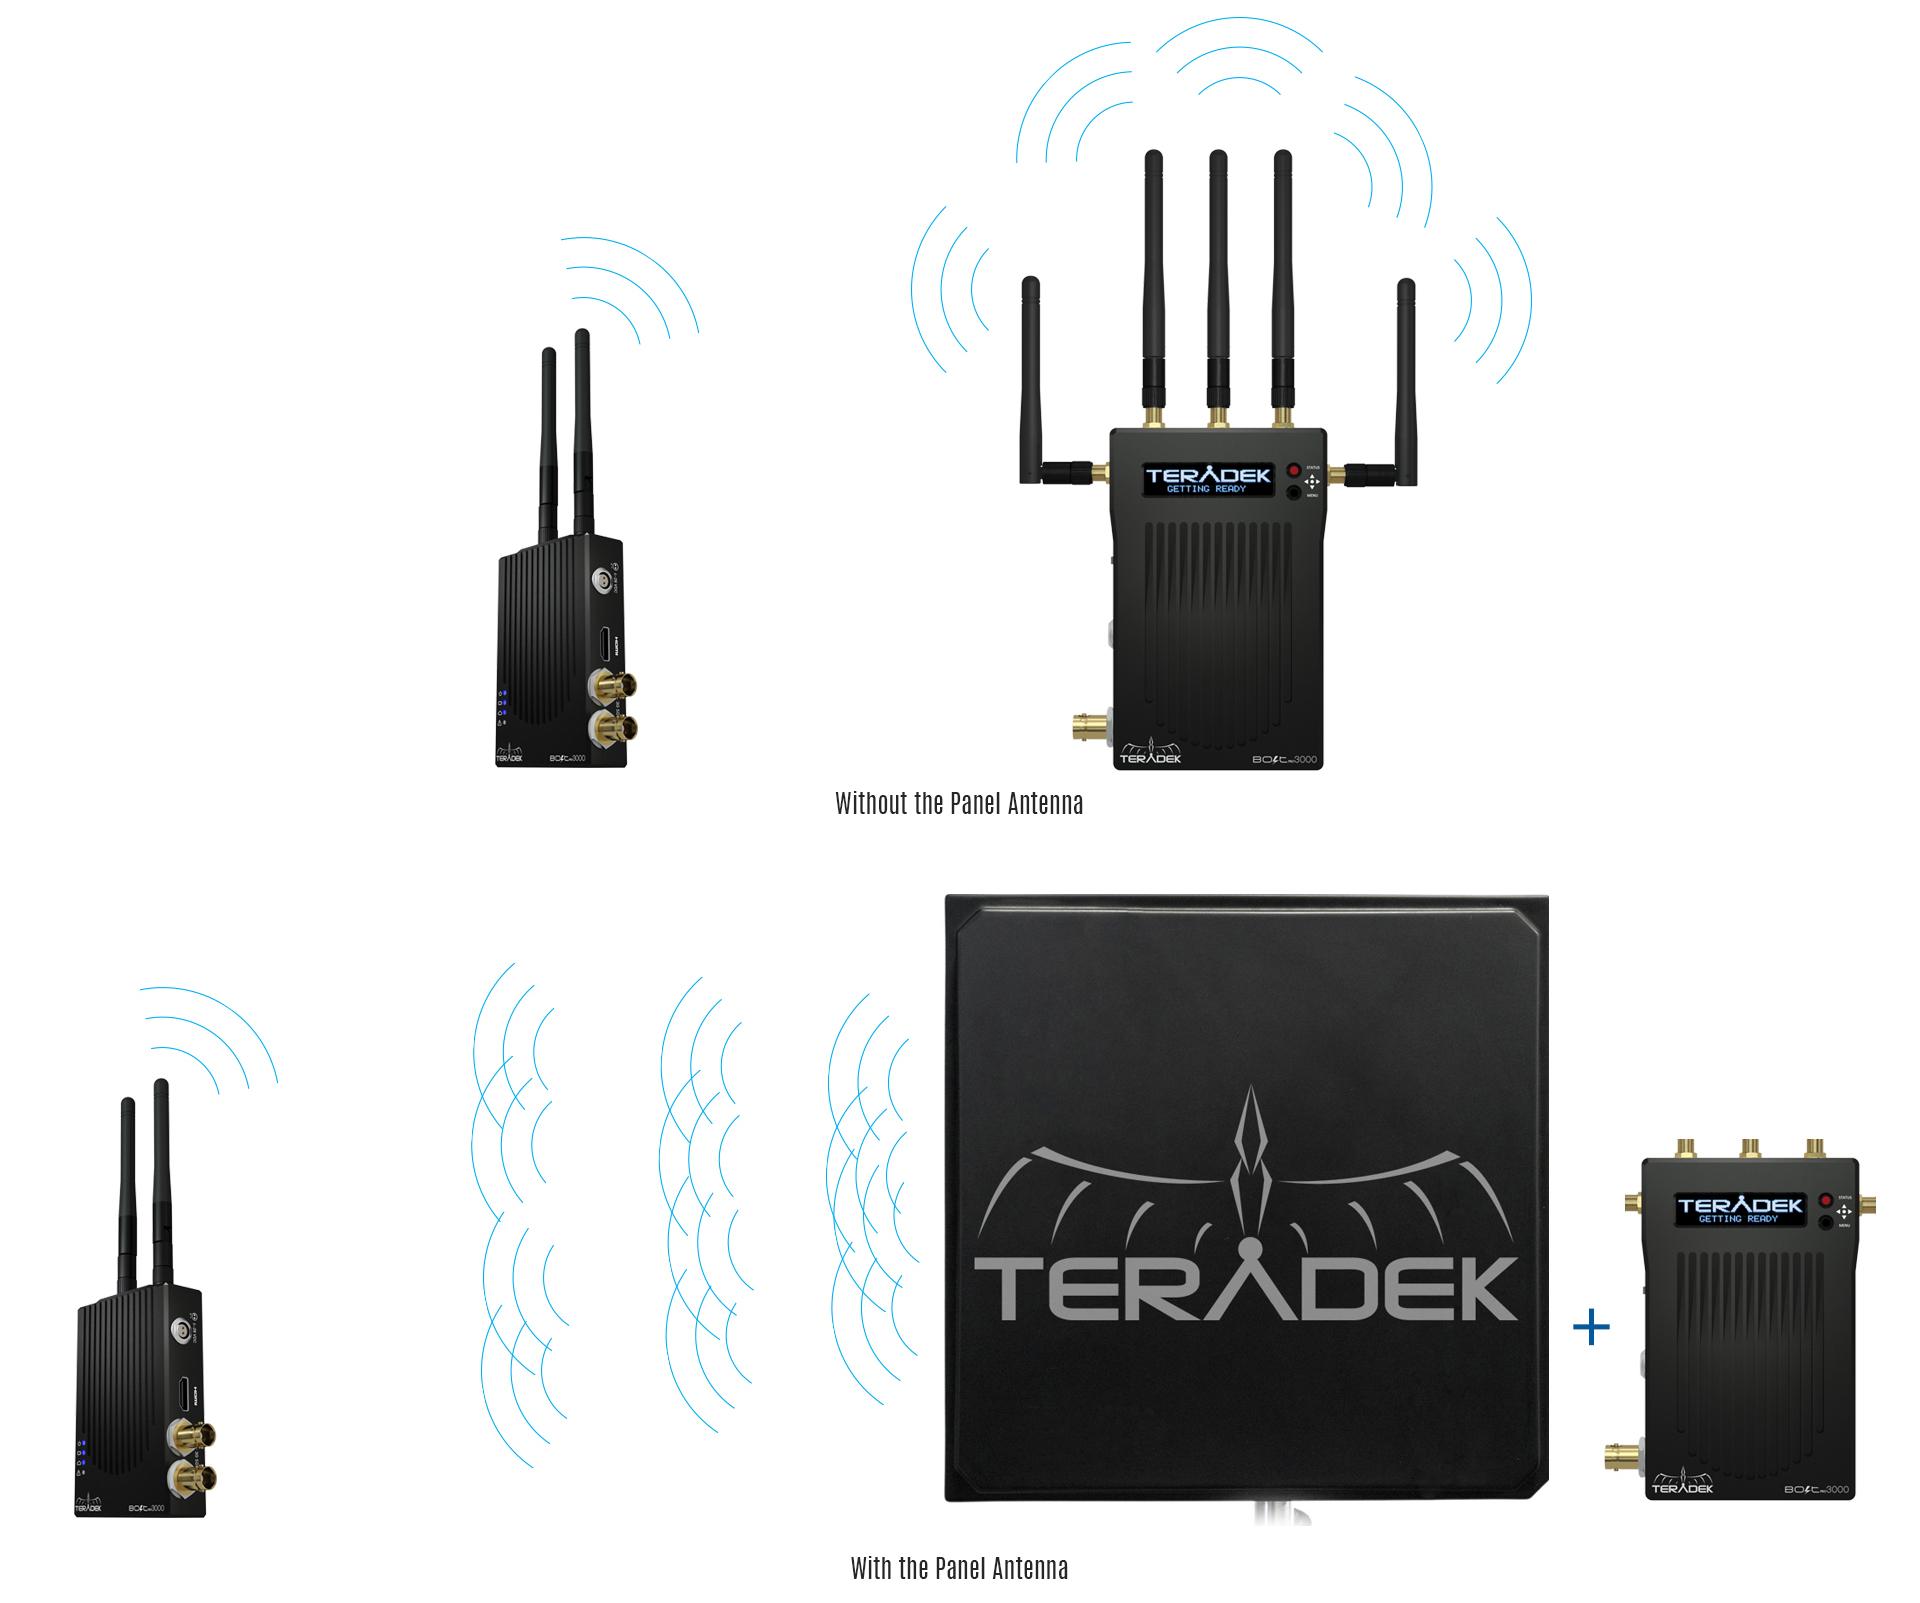 professional wireless video zero delay visually lossless professional wireless video zero delay visually lossless teradek llc wireless hd video